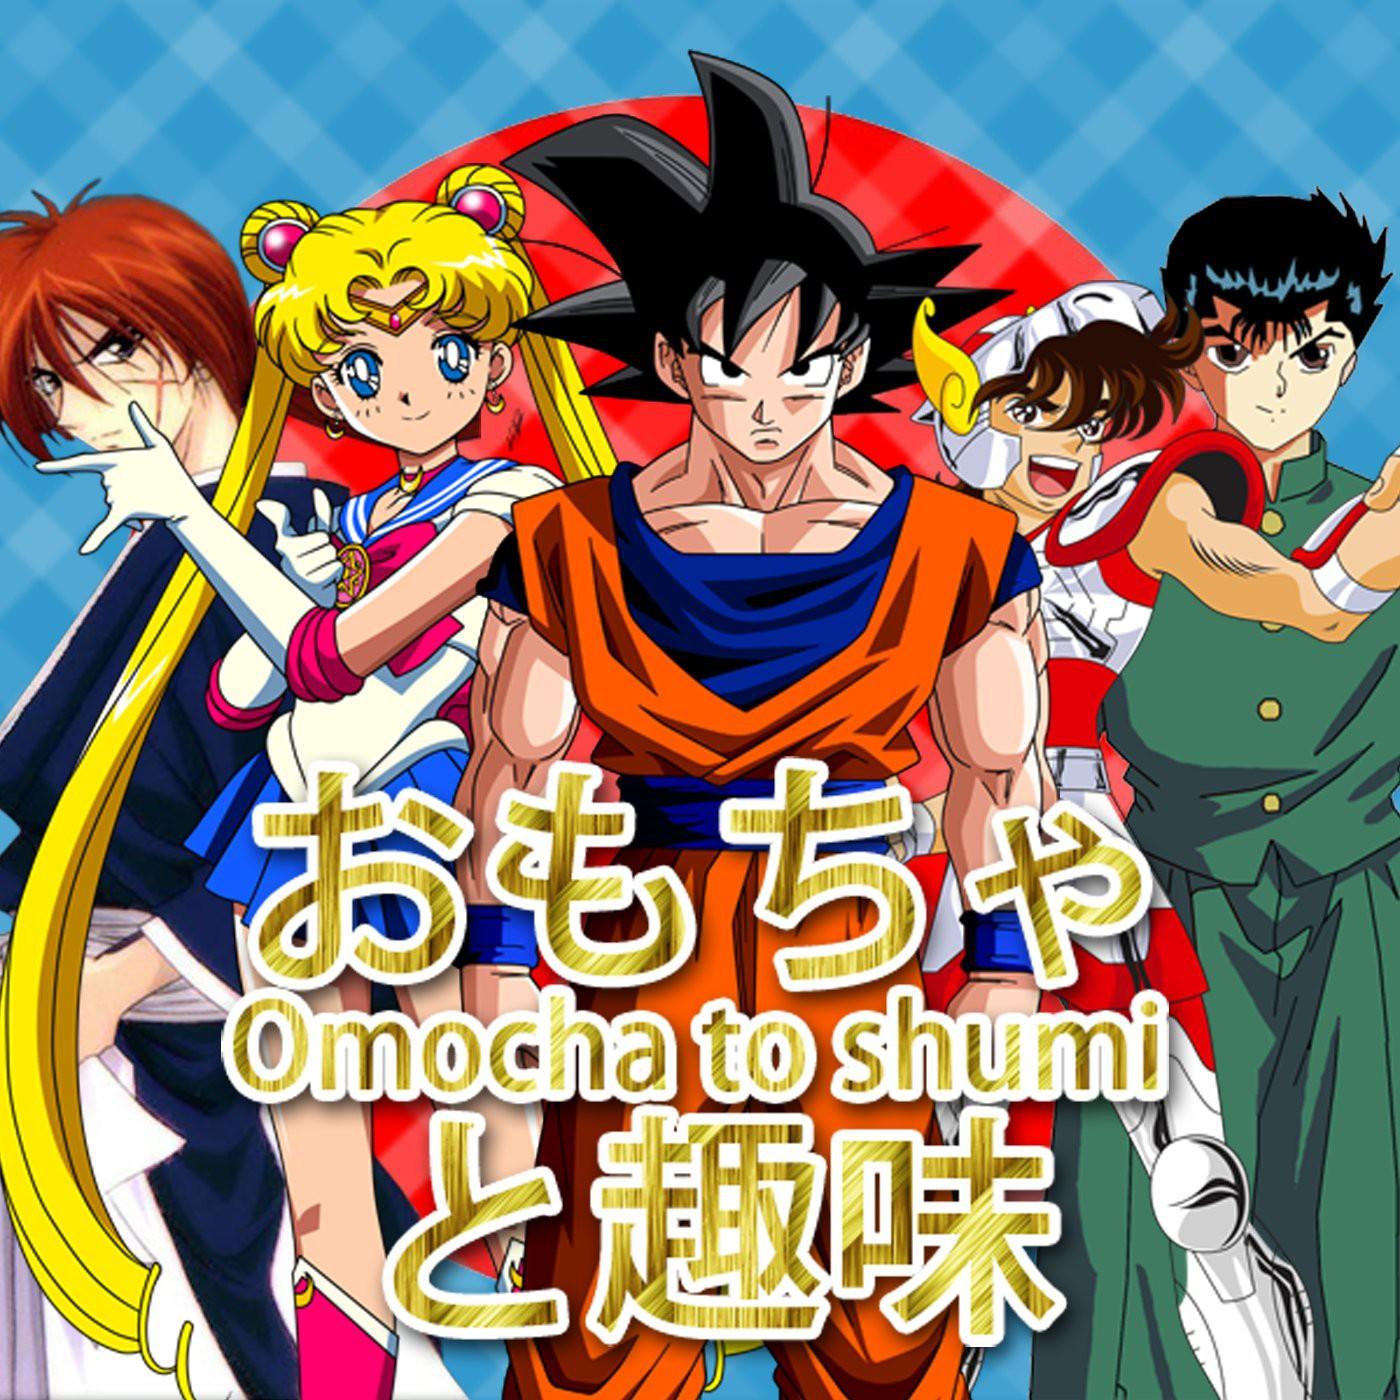 <![CDATA[Omocha to shumi]]>